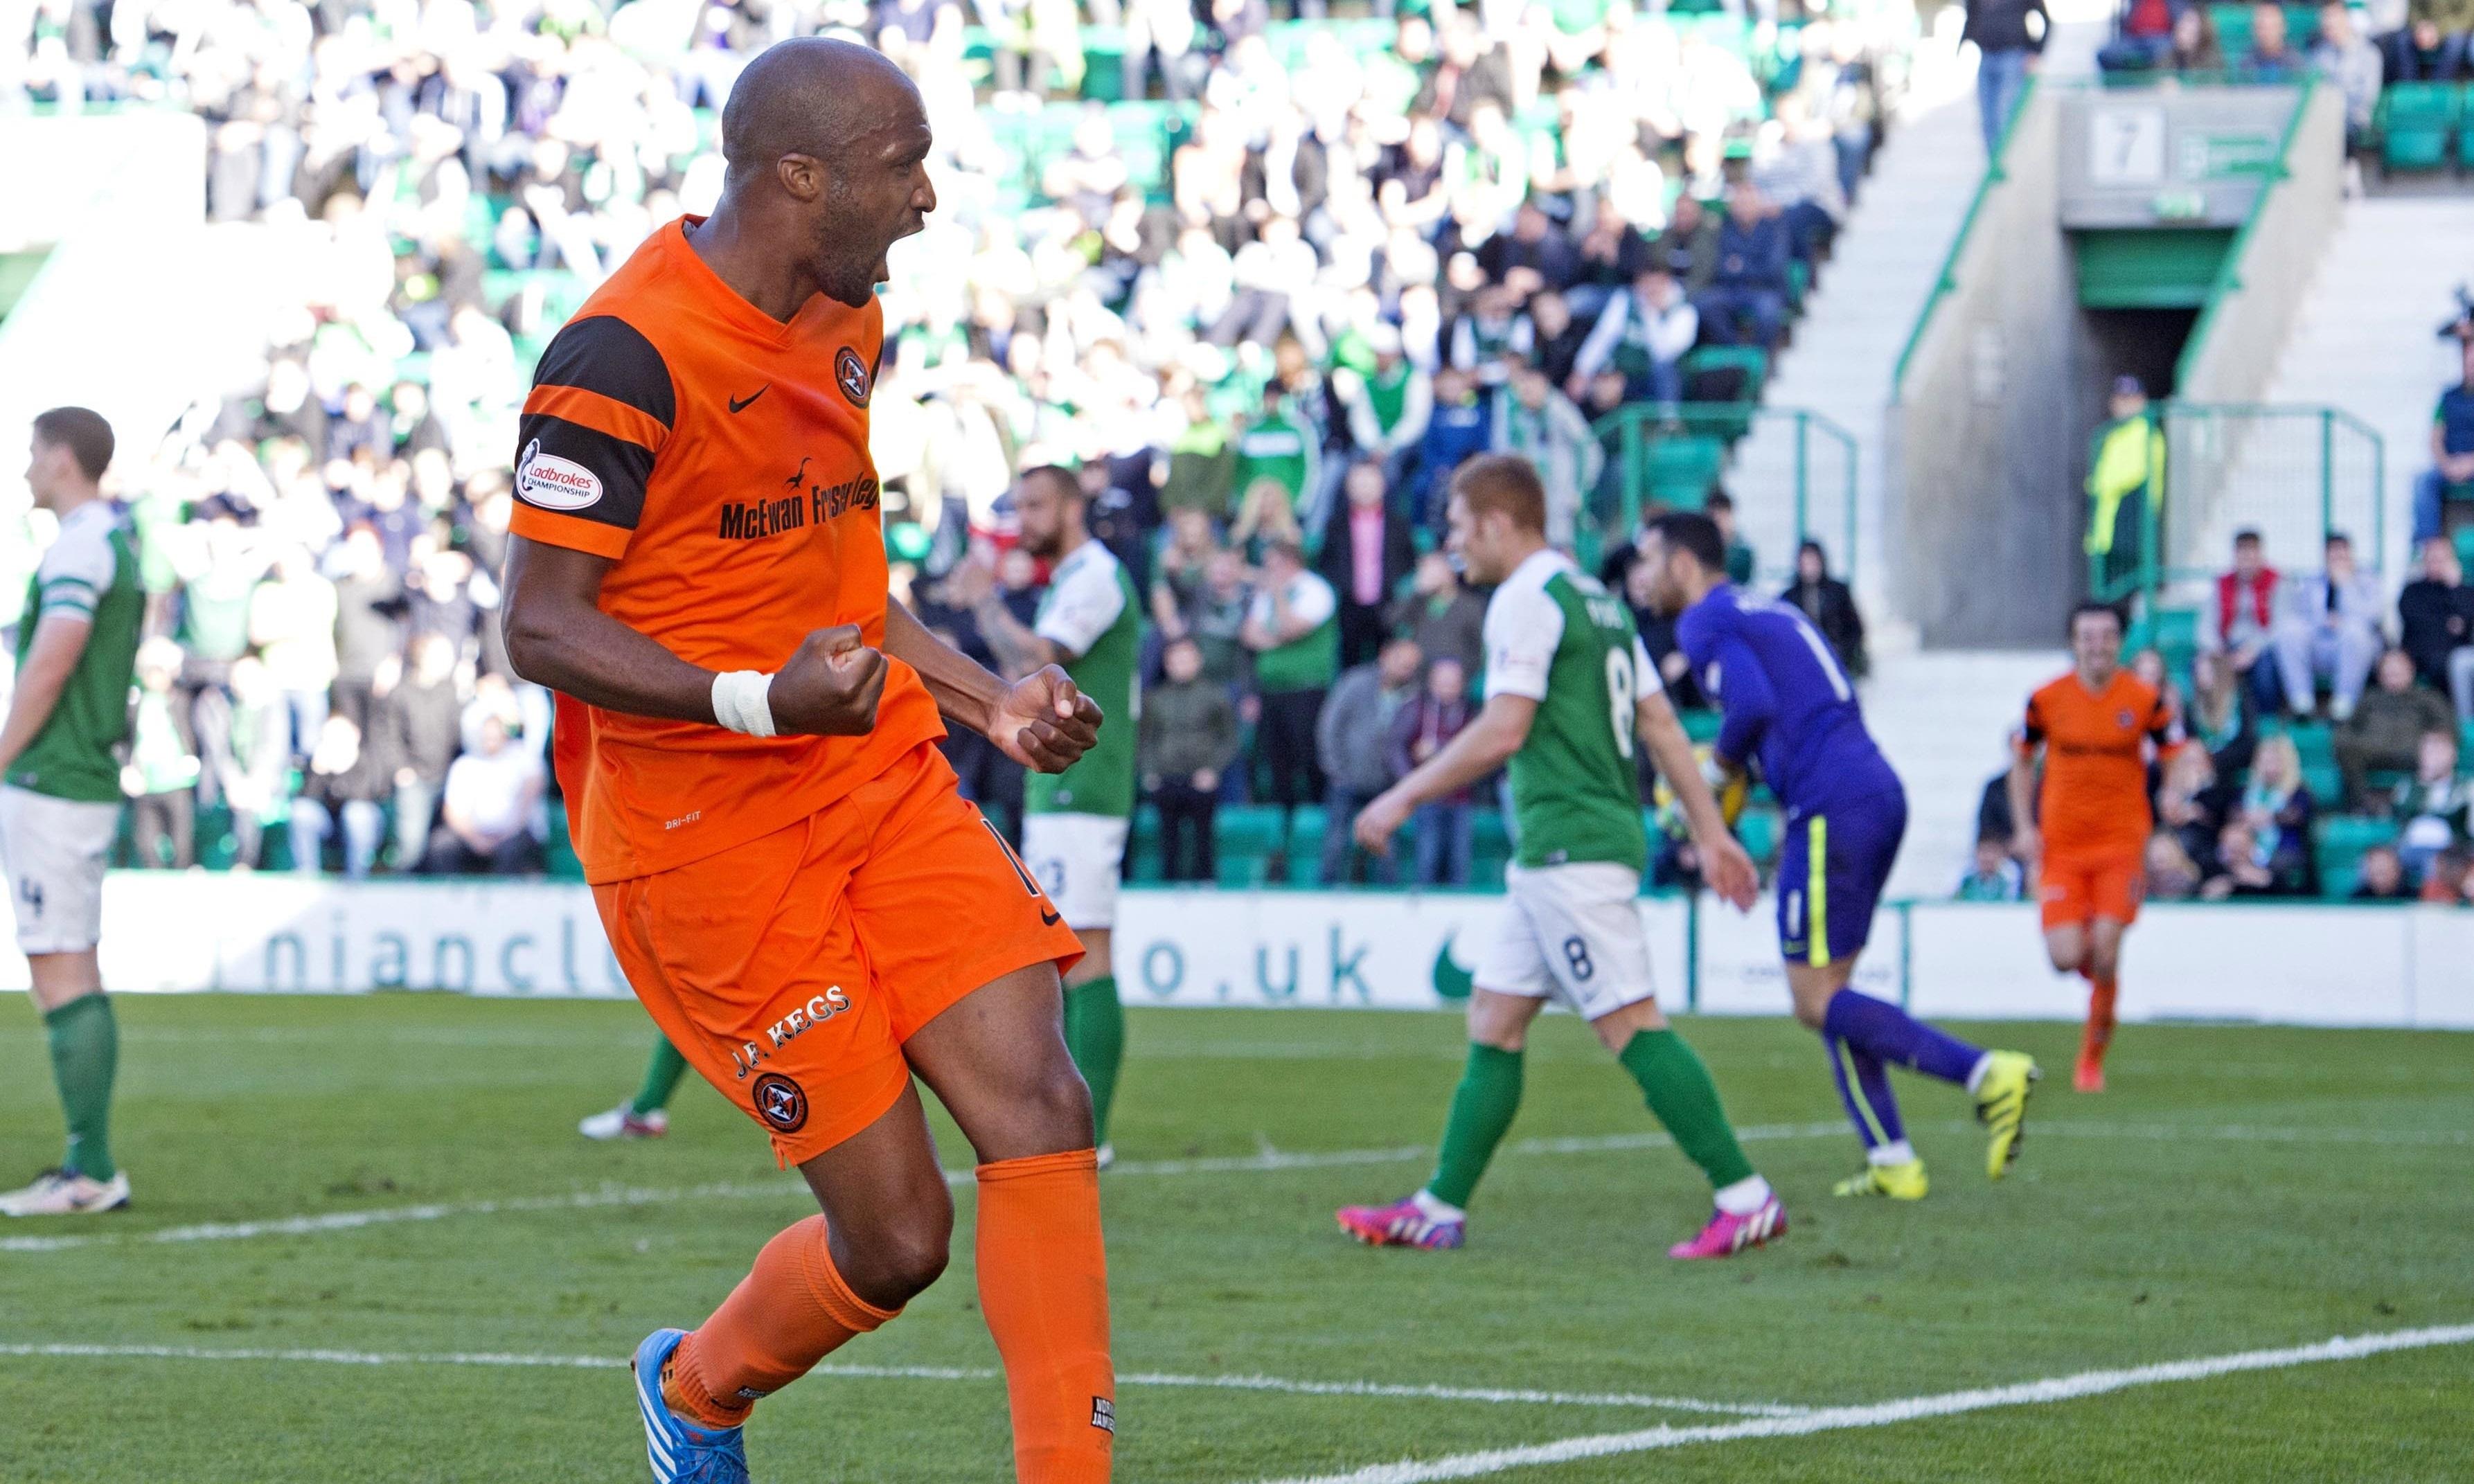 William Edjenguele after levelling the scoring for Dundee United